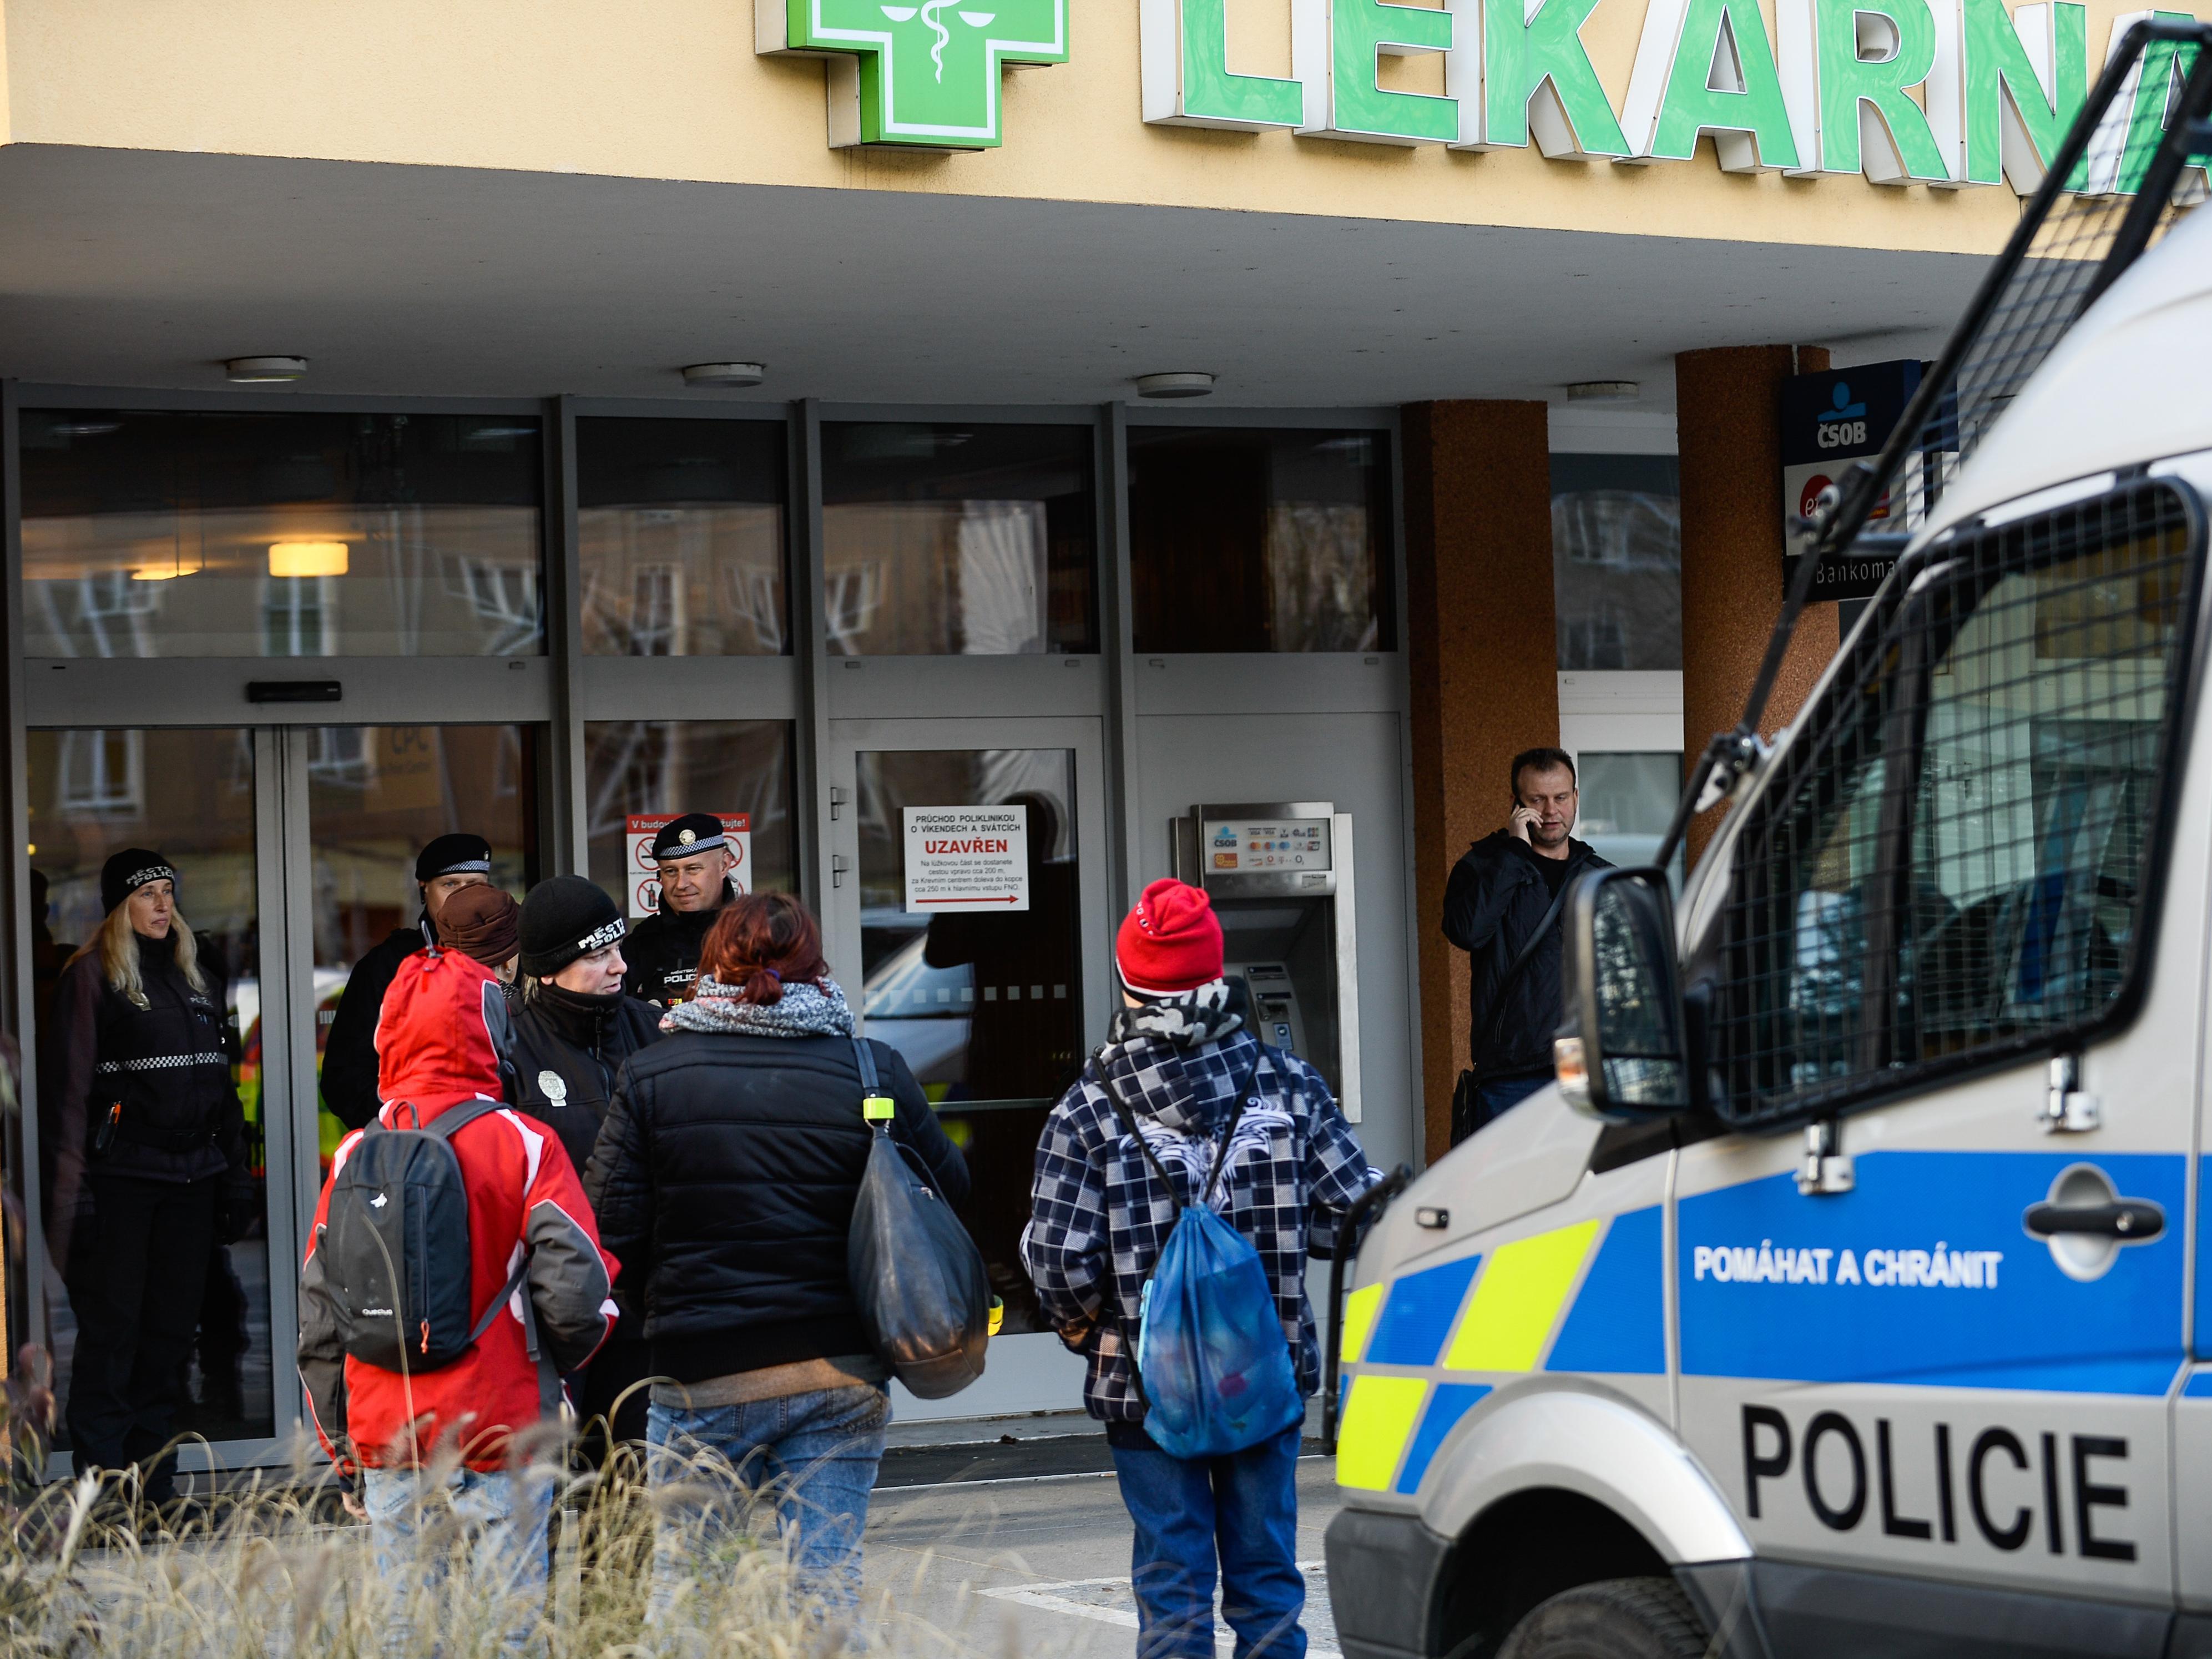 Gunman Kills 6 In Attack Inside Czech Hospital's Waiting Room